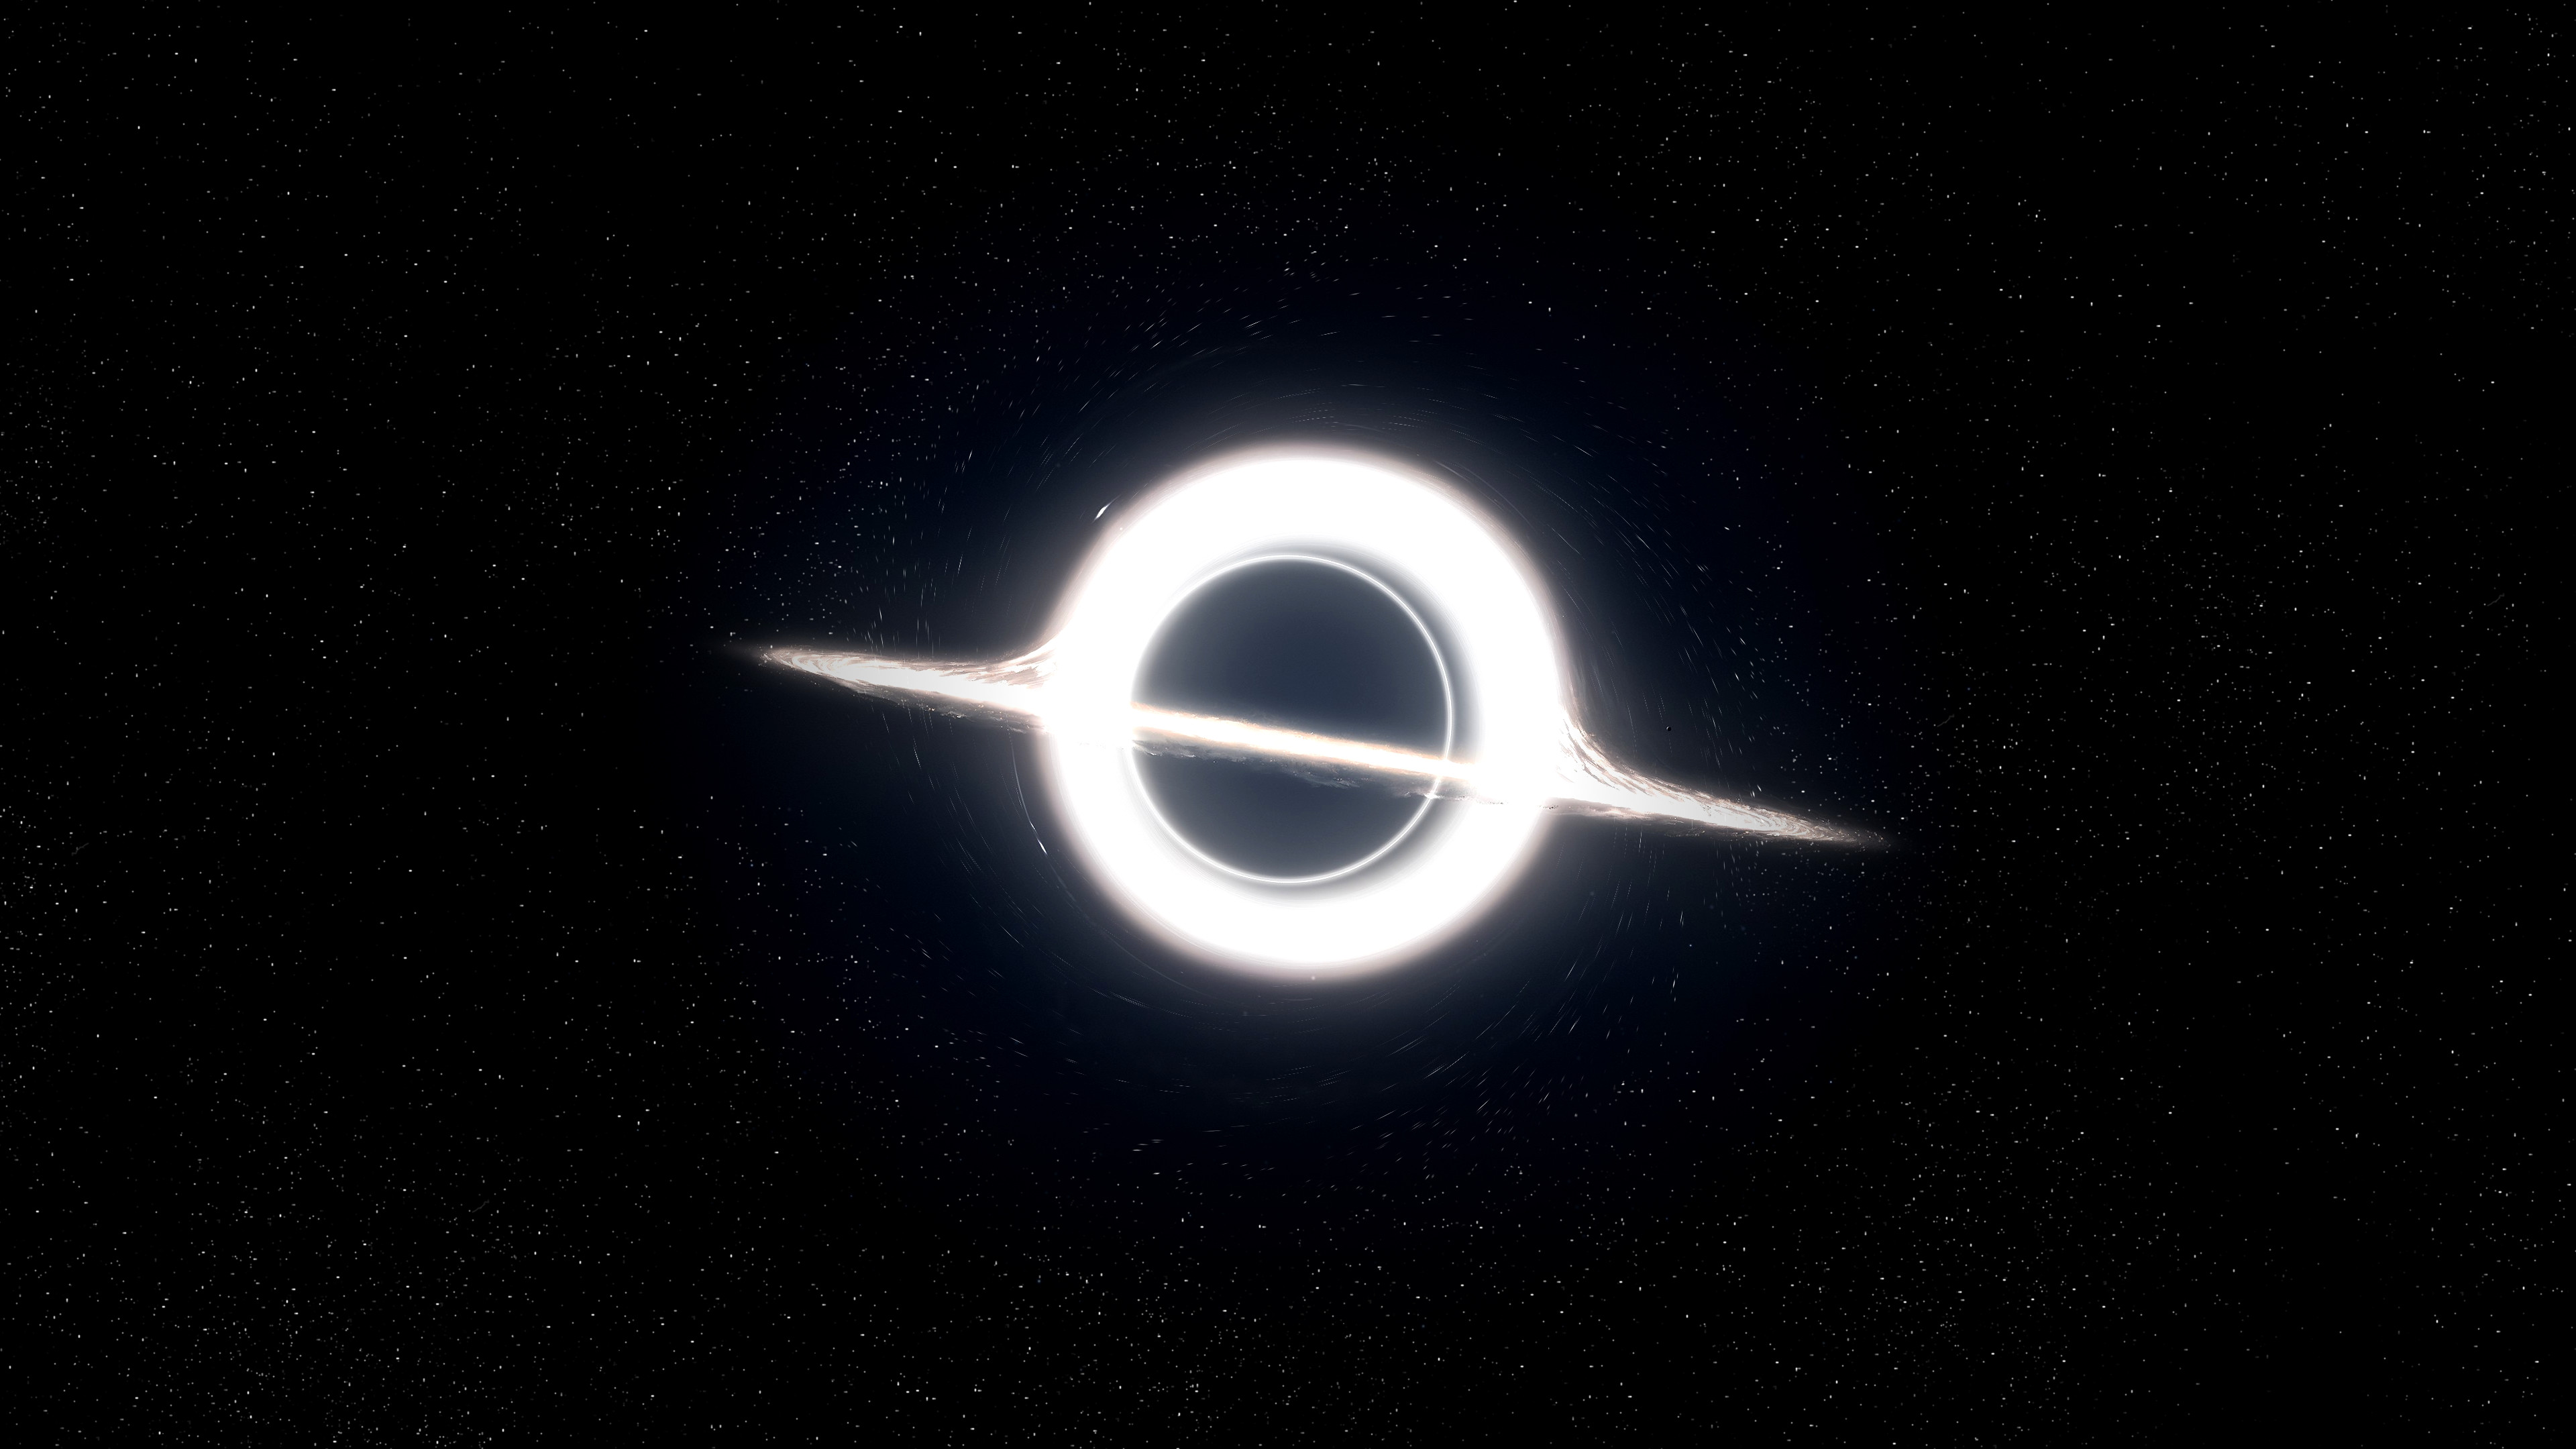 Gargantua, the black hole from Interstellar   [3840×2160] …